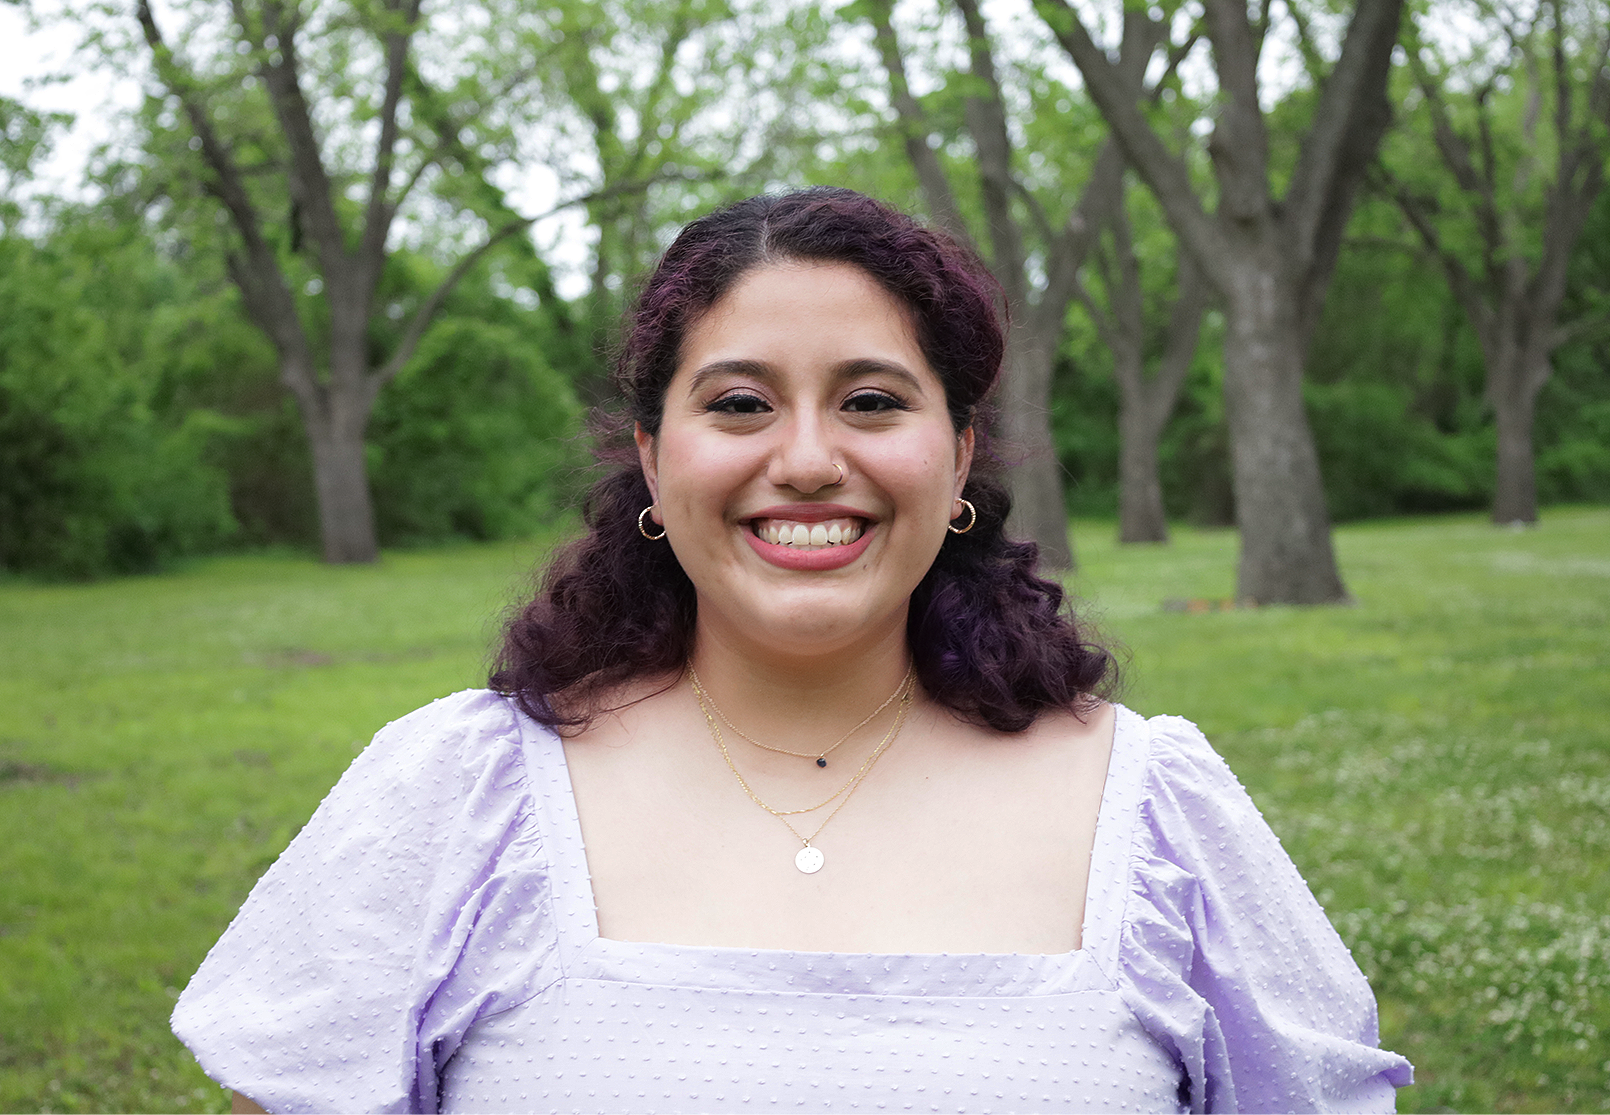 Angelica Zavala Music Therapy intern Headshot